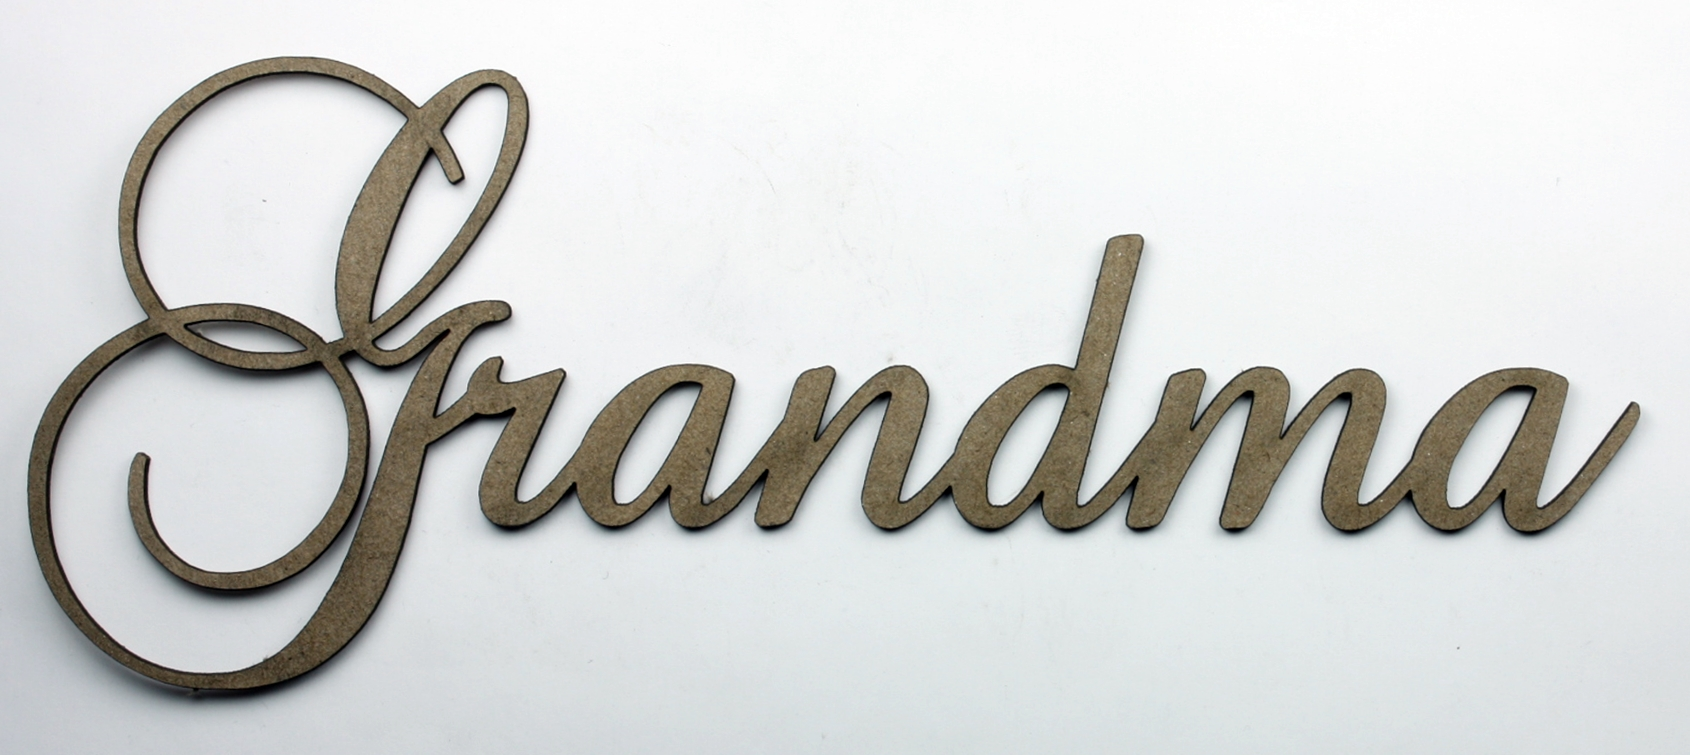 Essay of grandmother